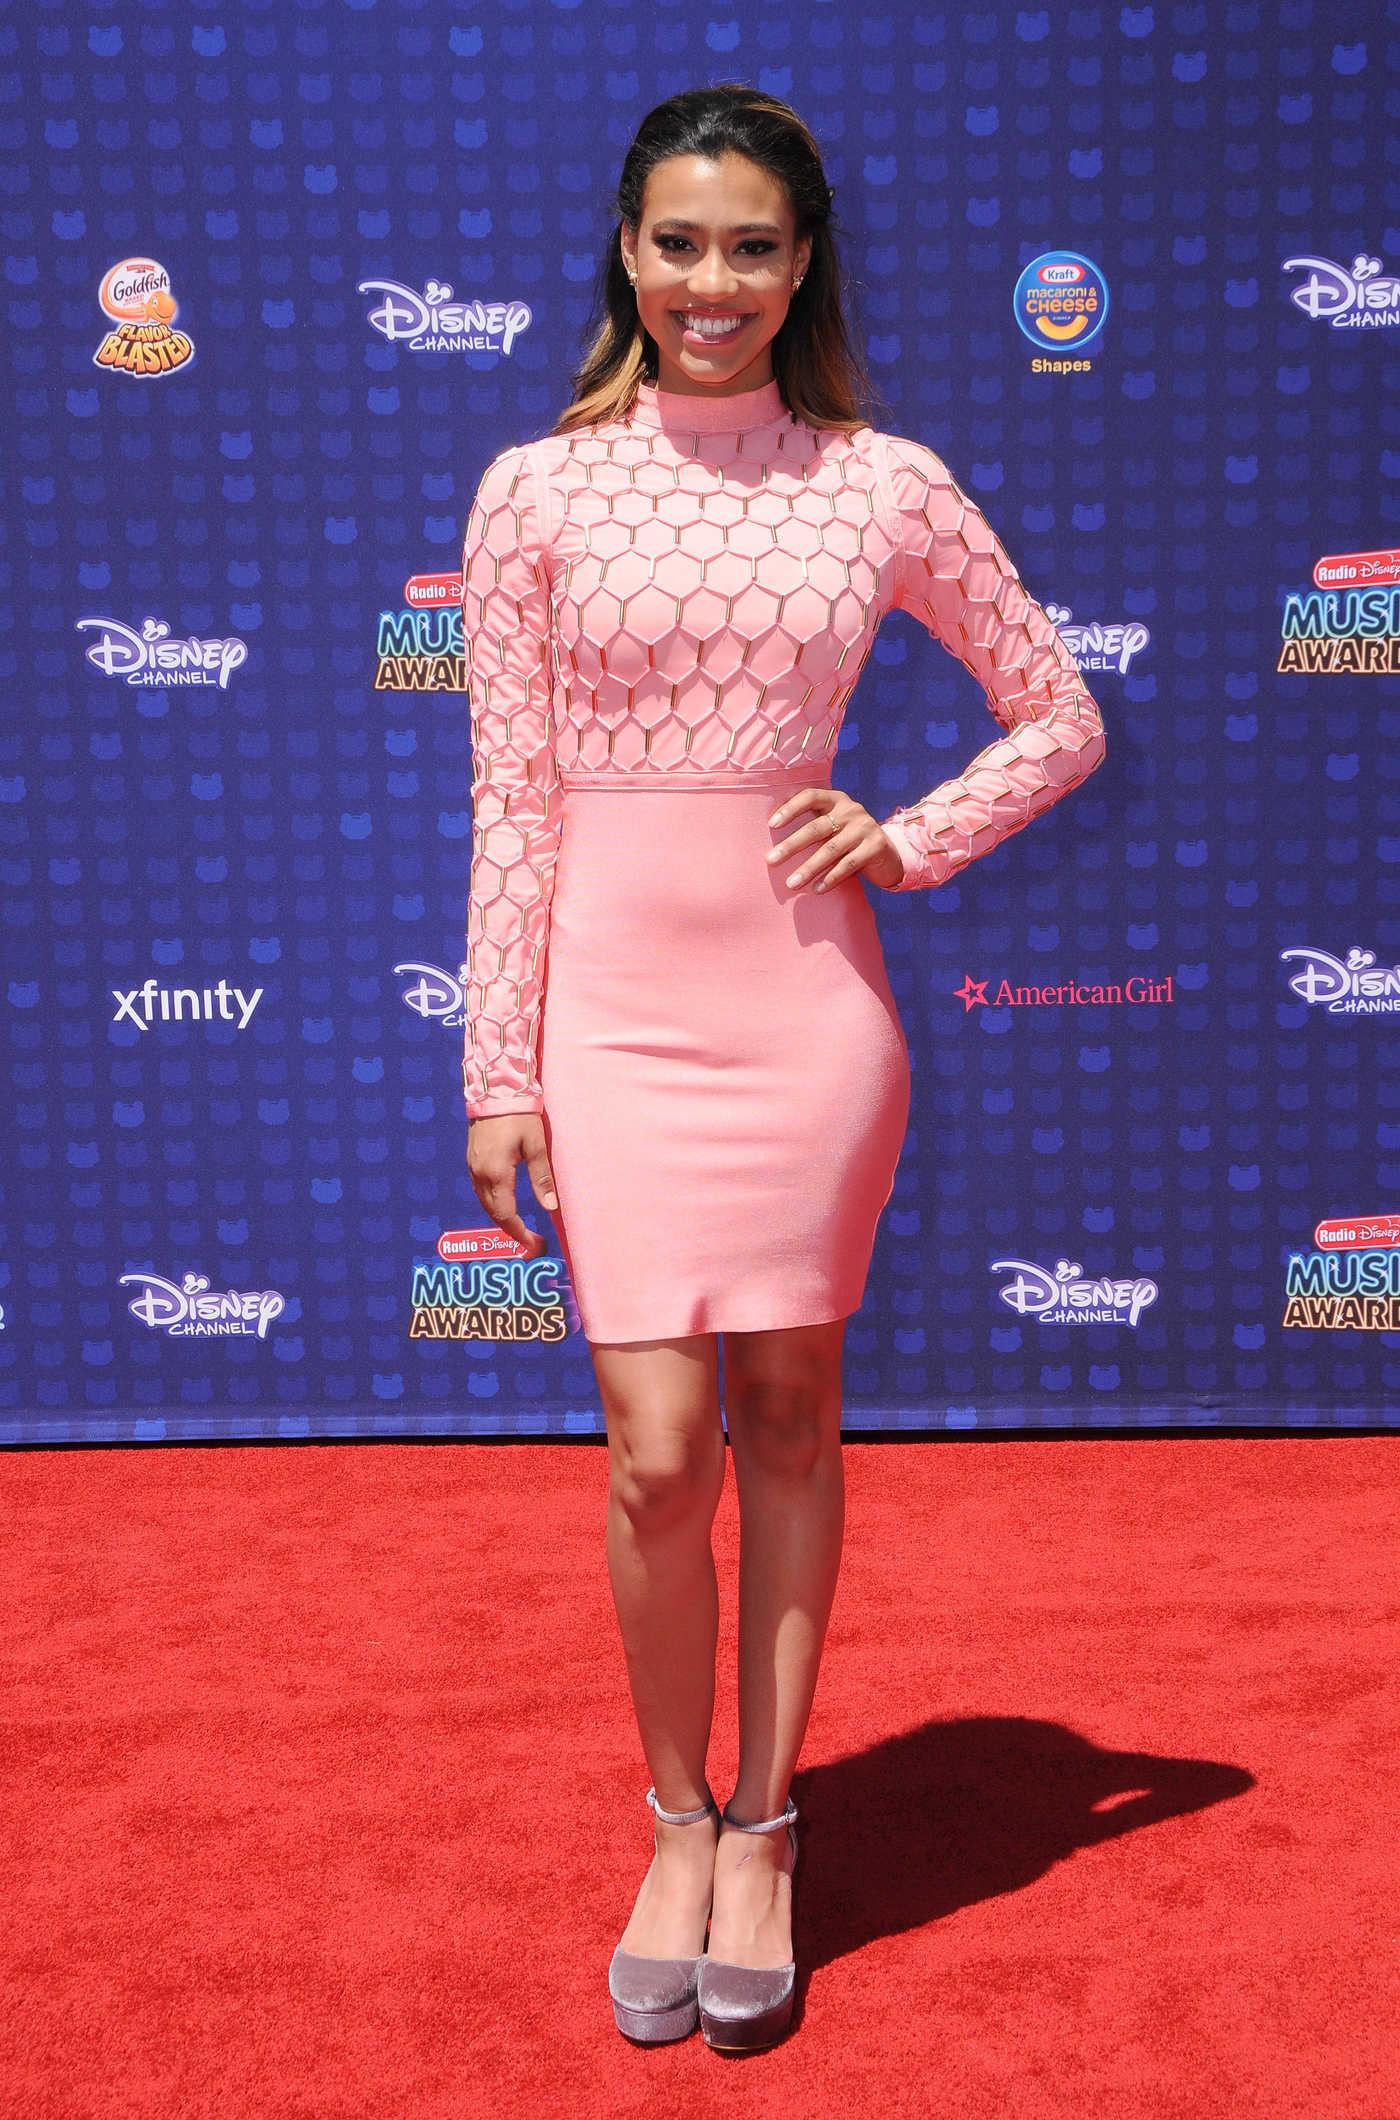 Kara Royster at the 2017 Radio Disney Music Awards in Los Angeles 04/29/2017